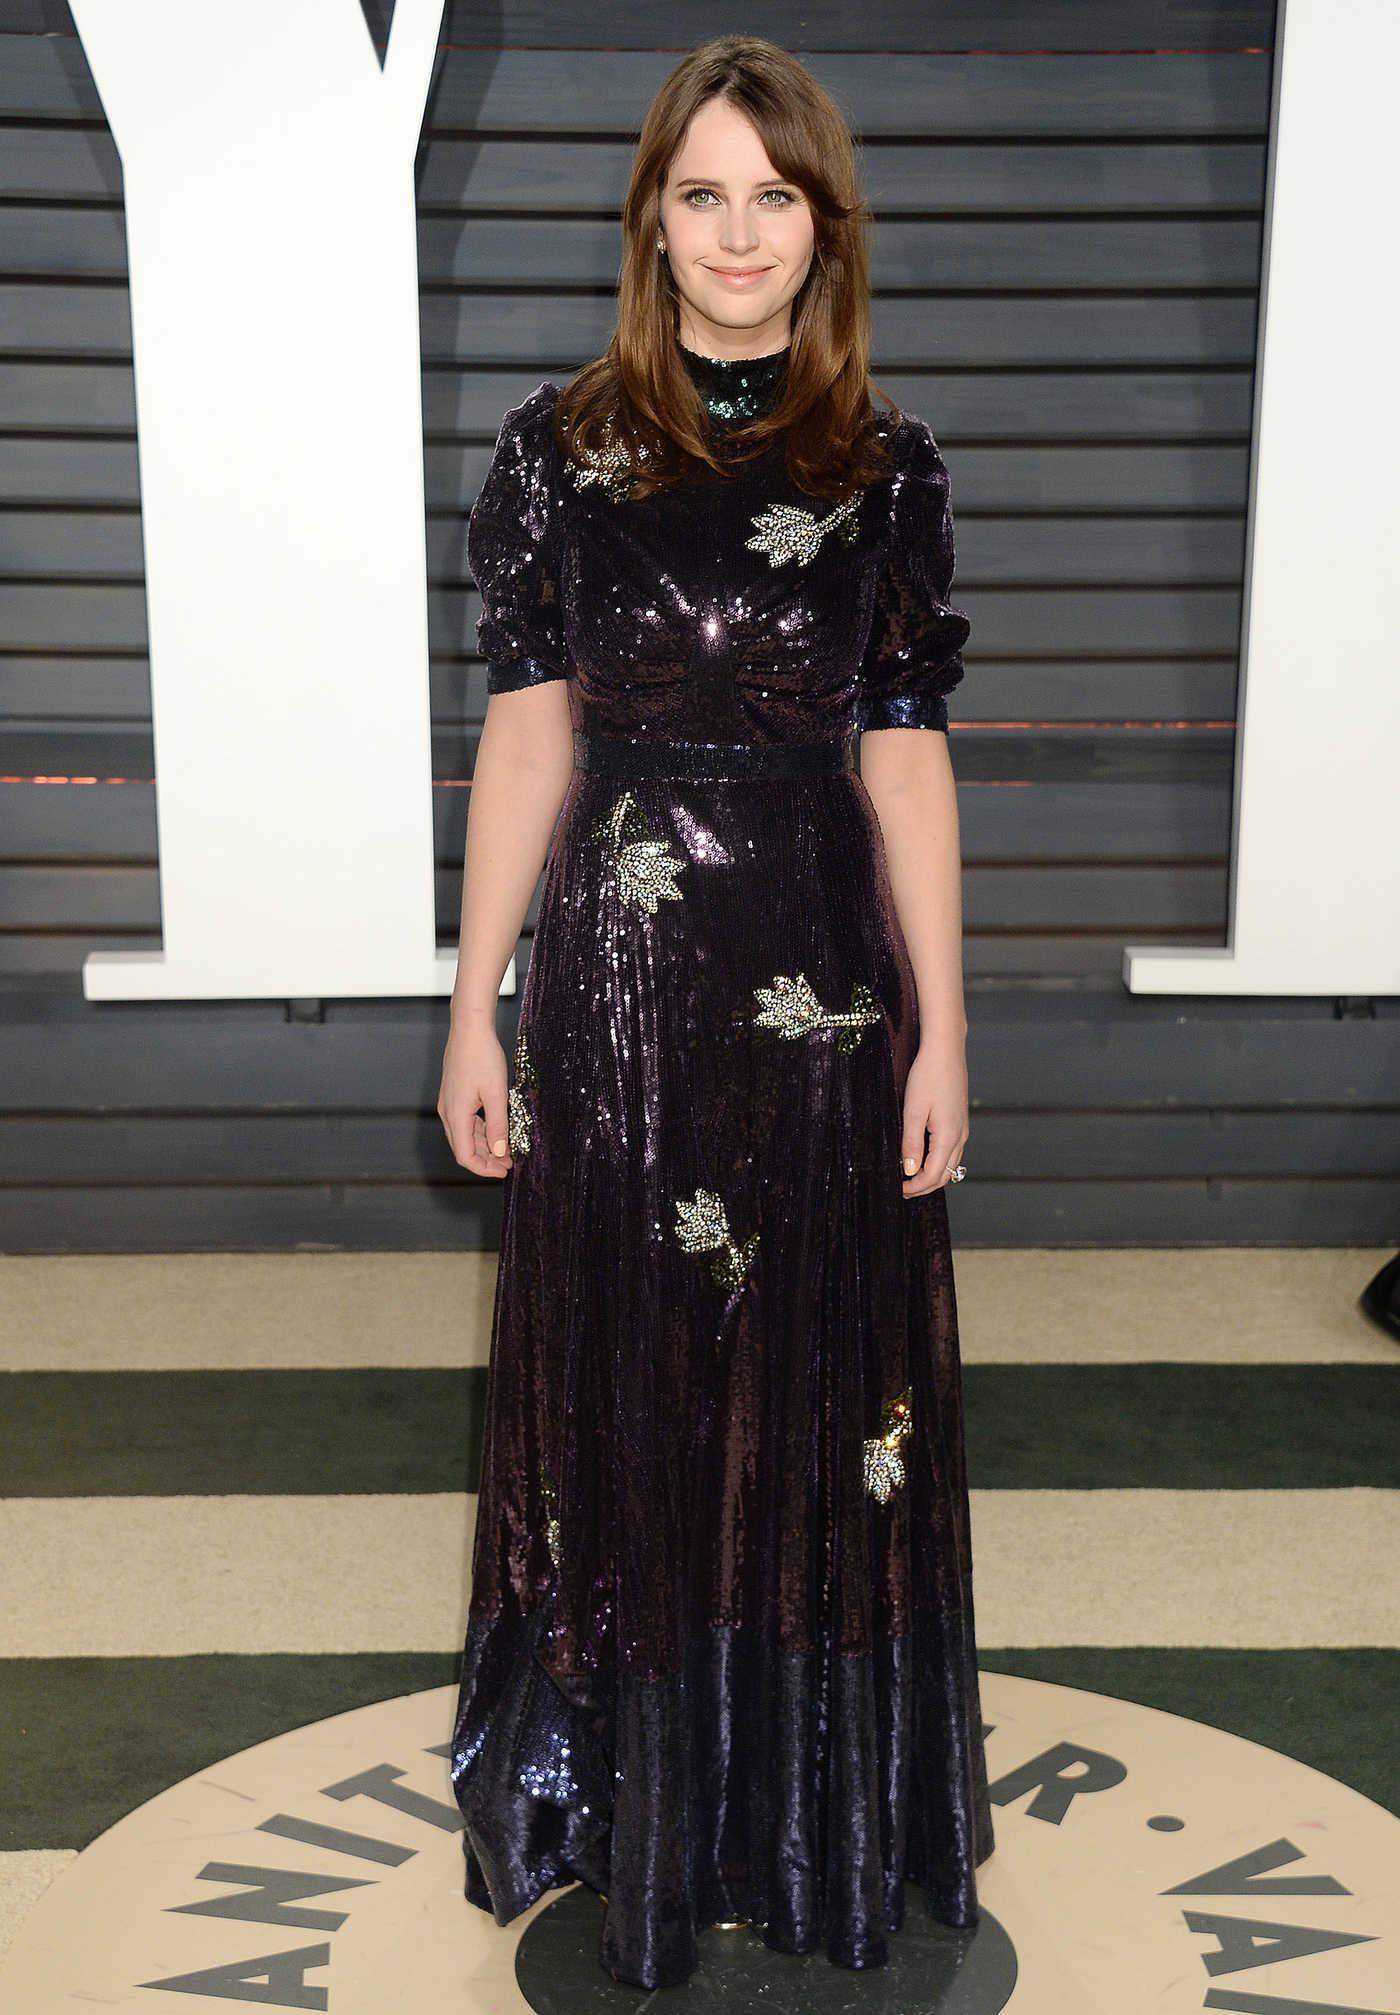 Felicity Jones at the 2017 Vanity Fair Oscar Party in Beverly Hills 02/26/2017